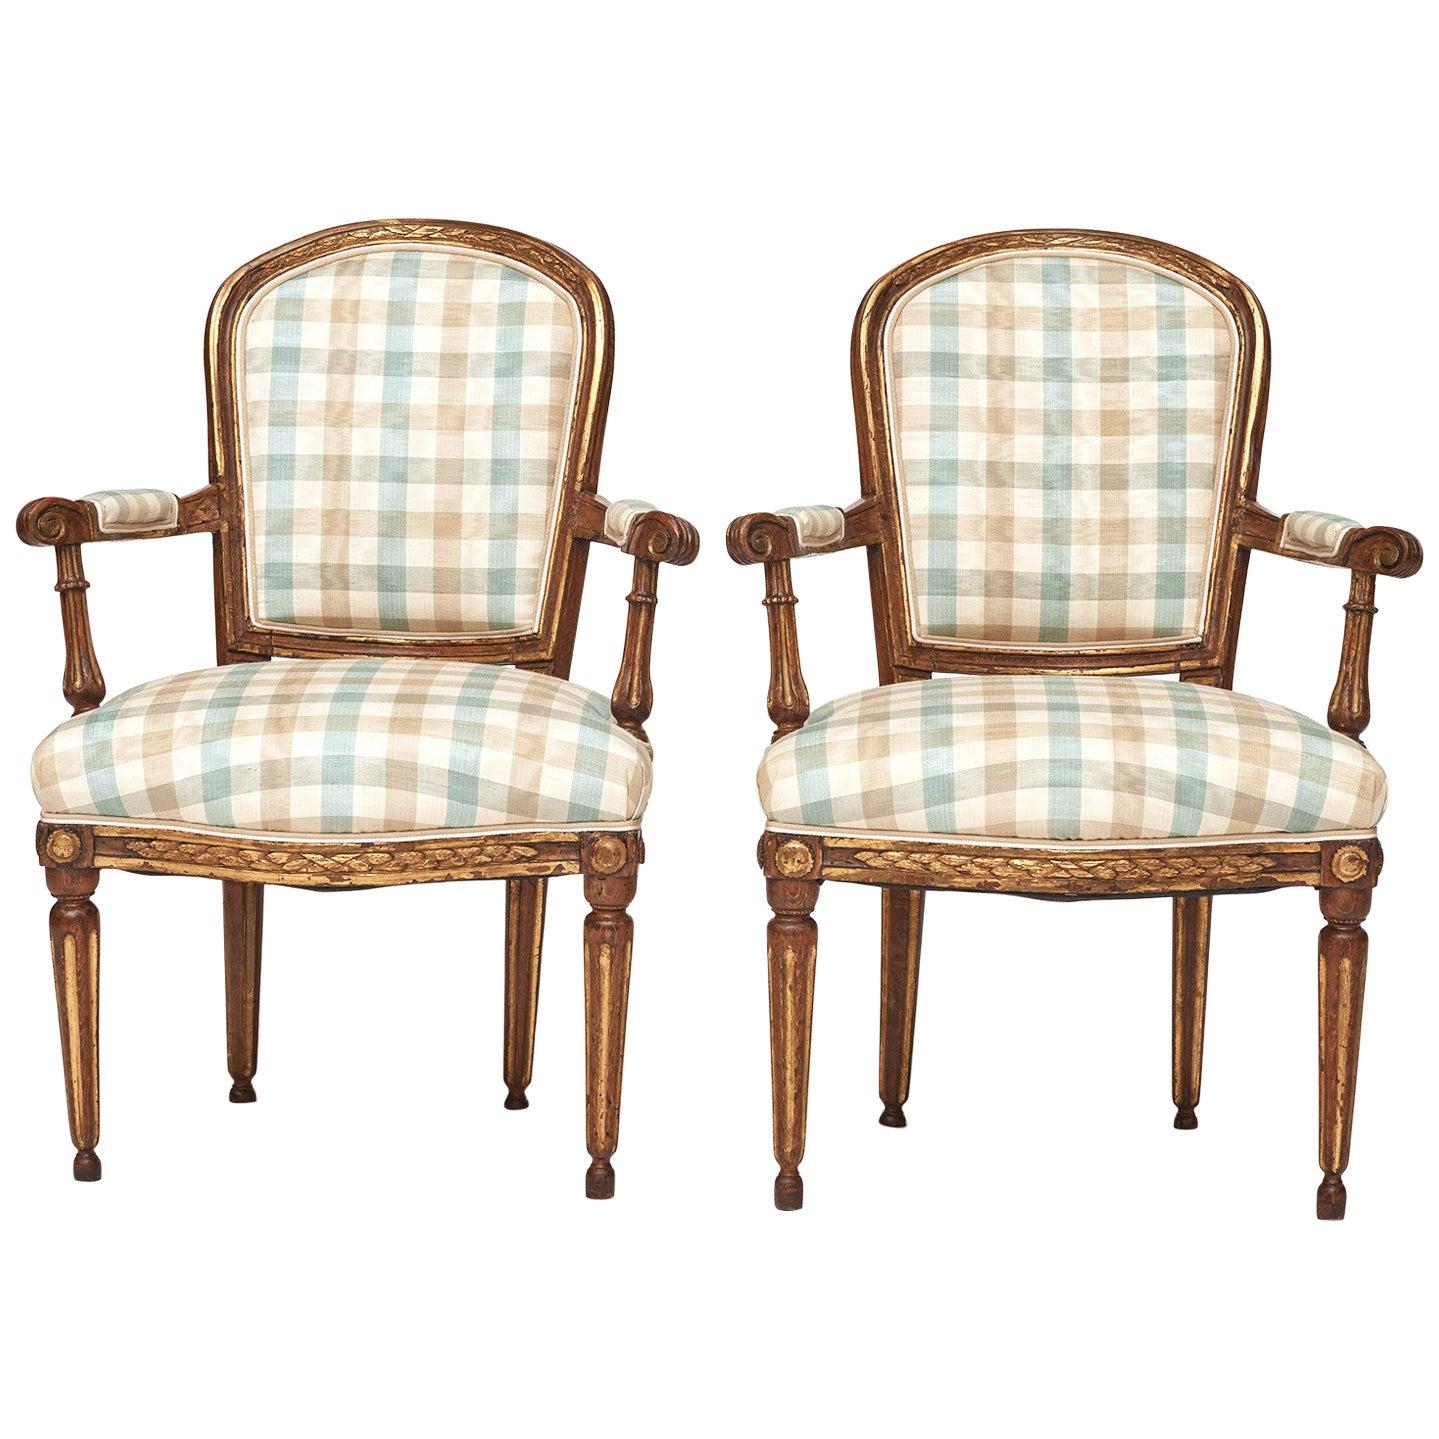 Pair of Late 18th Century Danish Louis XVI Giltwood Open Armchairs